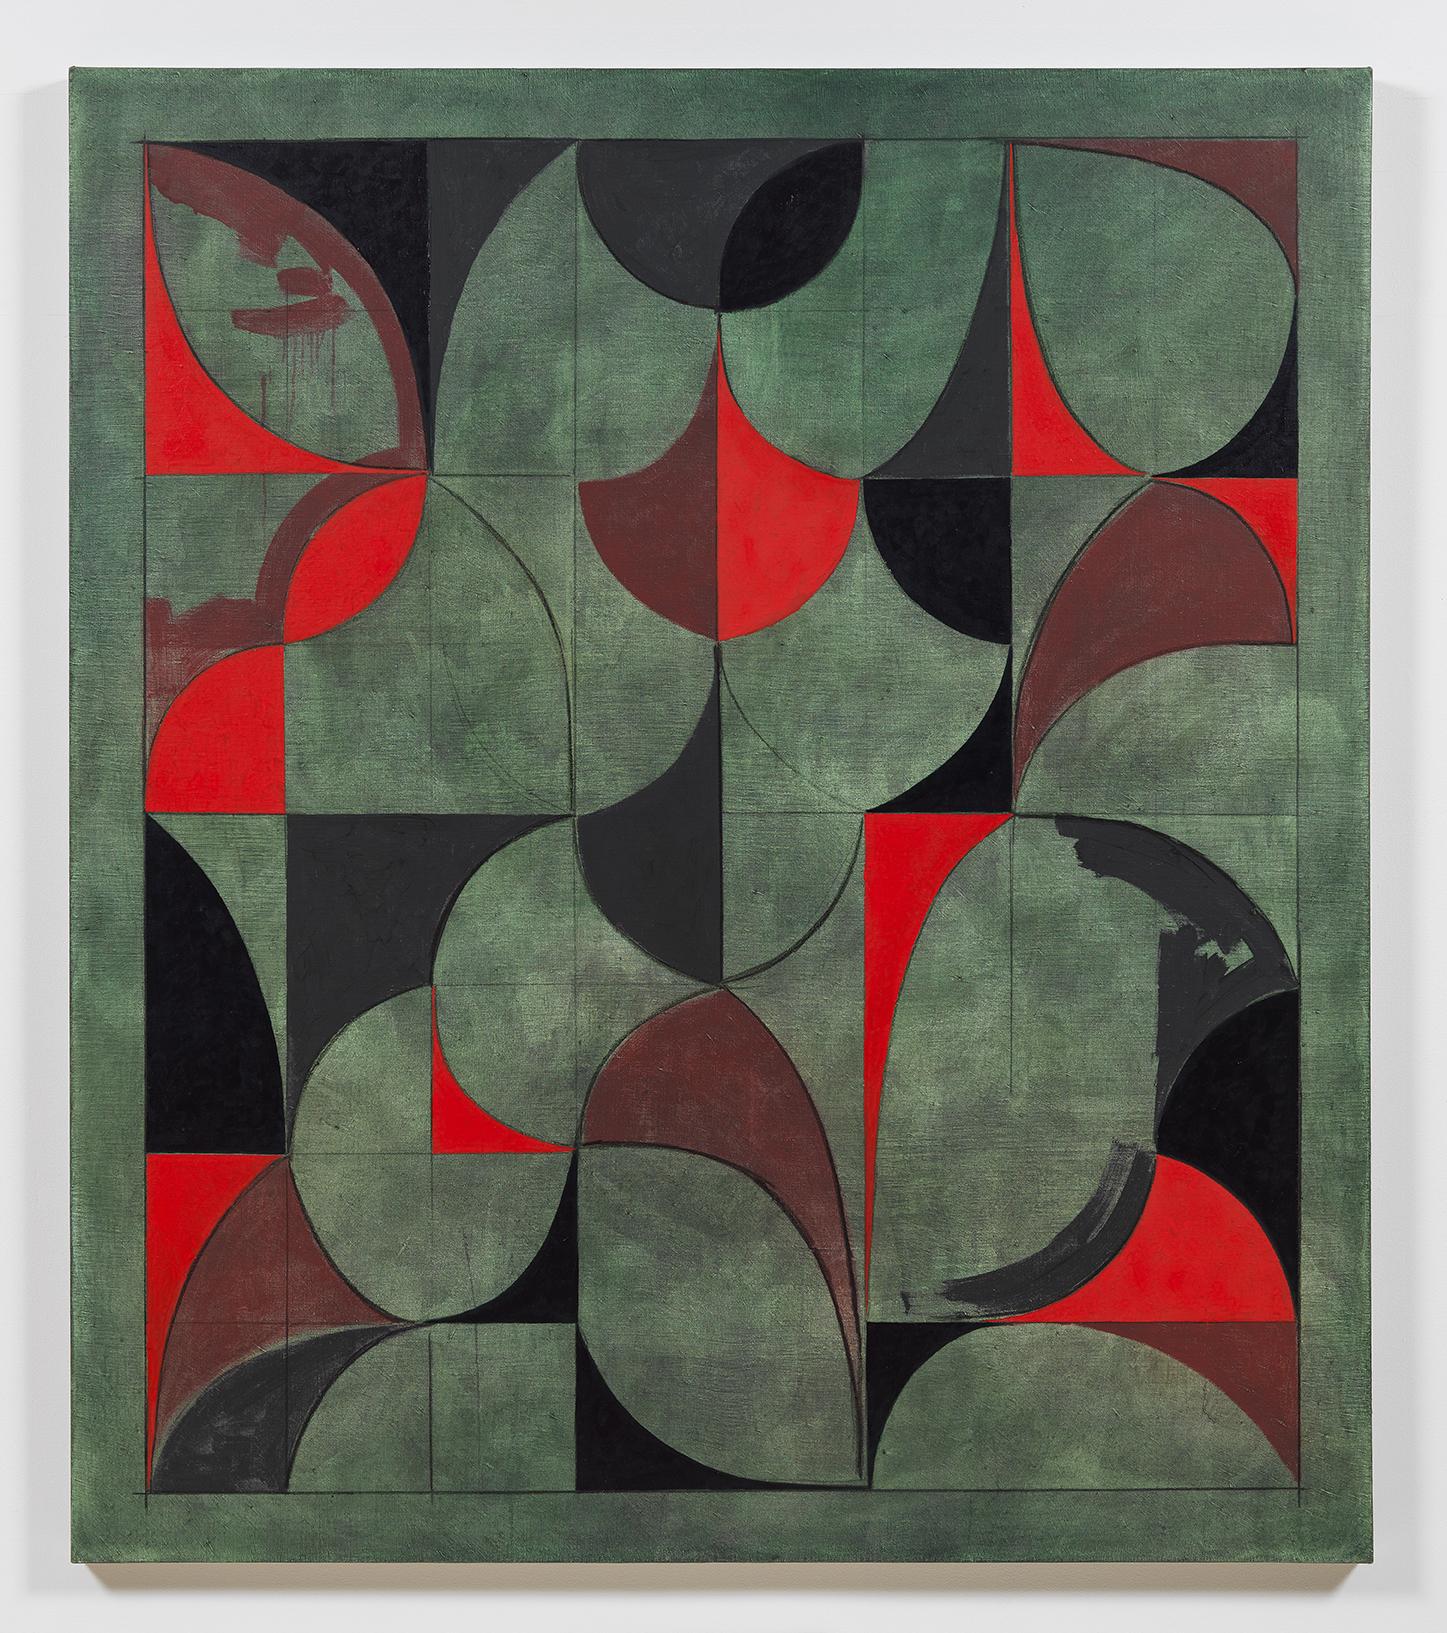 Kamrooz Aram, Arabesco, 2019, courtesy Green Art Gallery